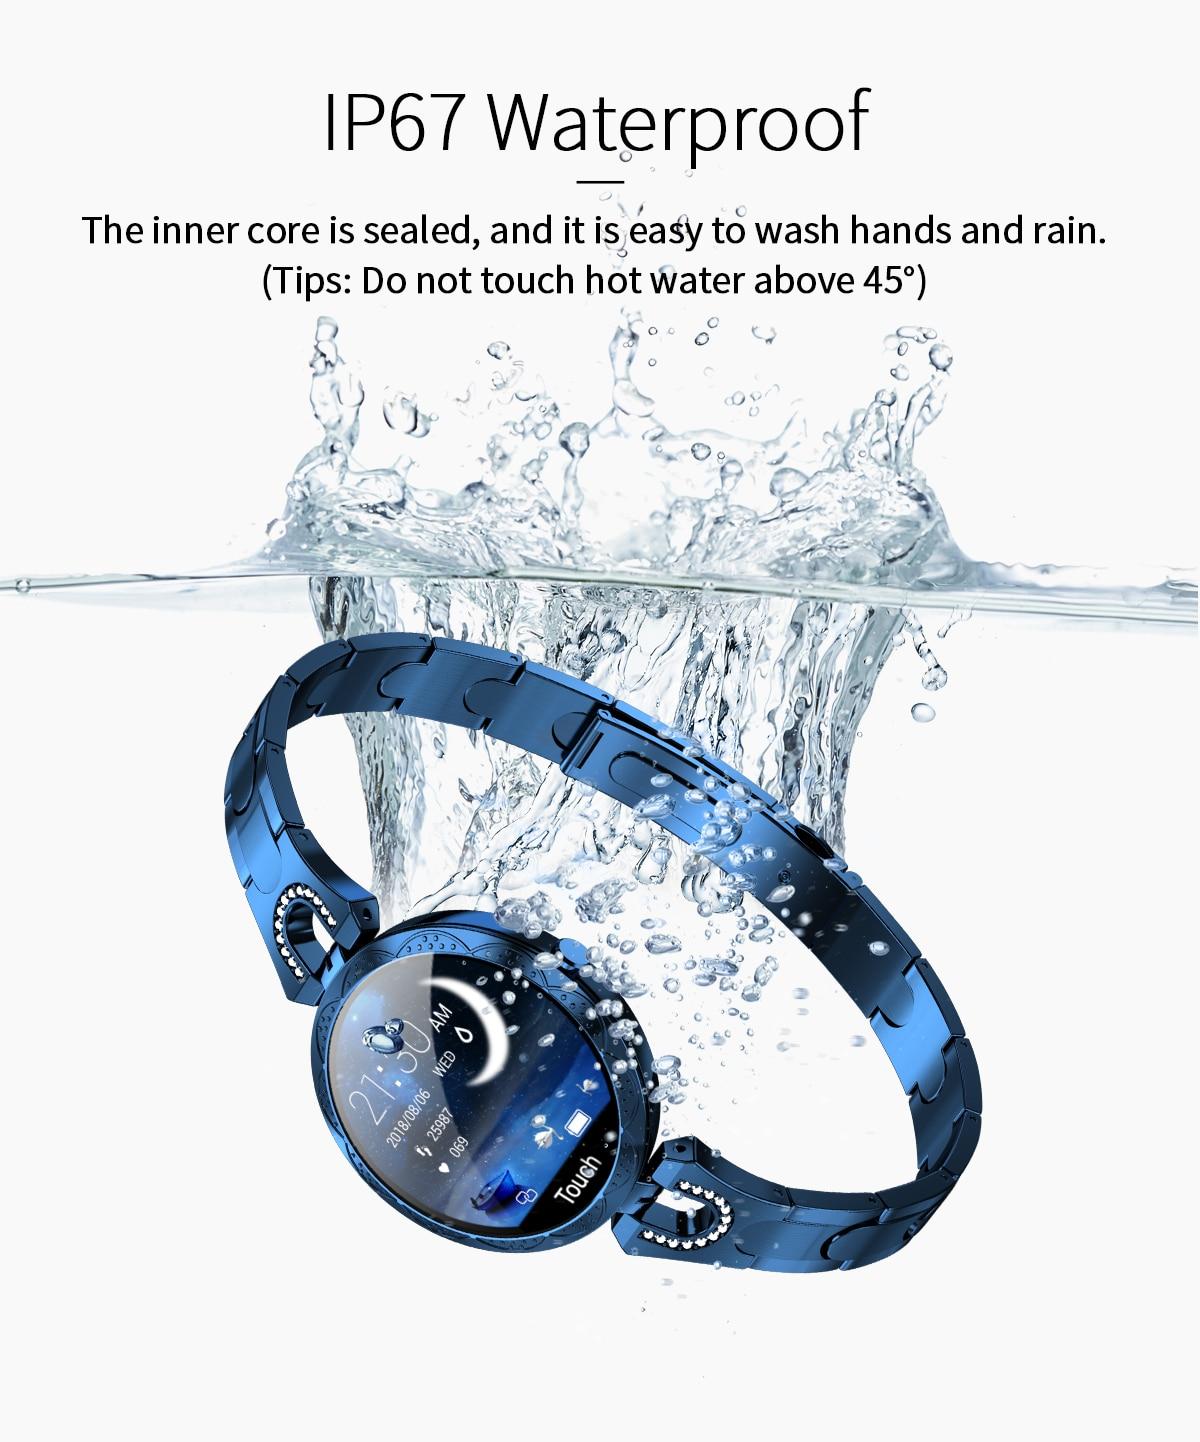 Hb86df4dada4548f198bea26e262ce5cad COBRAFLY AK15 Smart Watch Women Bracelet Heart Rate Monitoring IP67 Waterproof Fitness Tracker Ladies Watches for Xiaomi Iphone